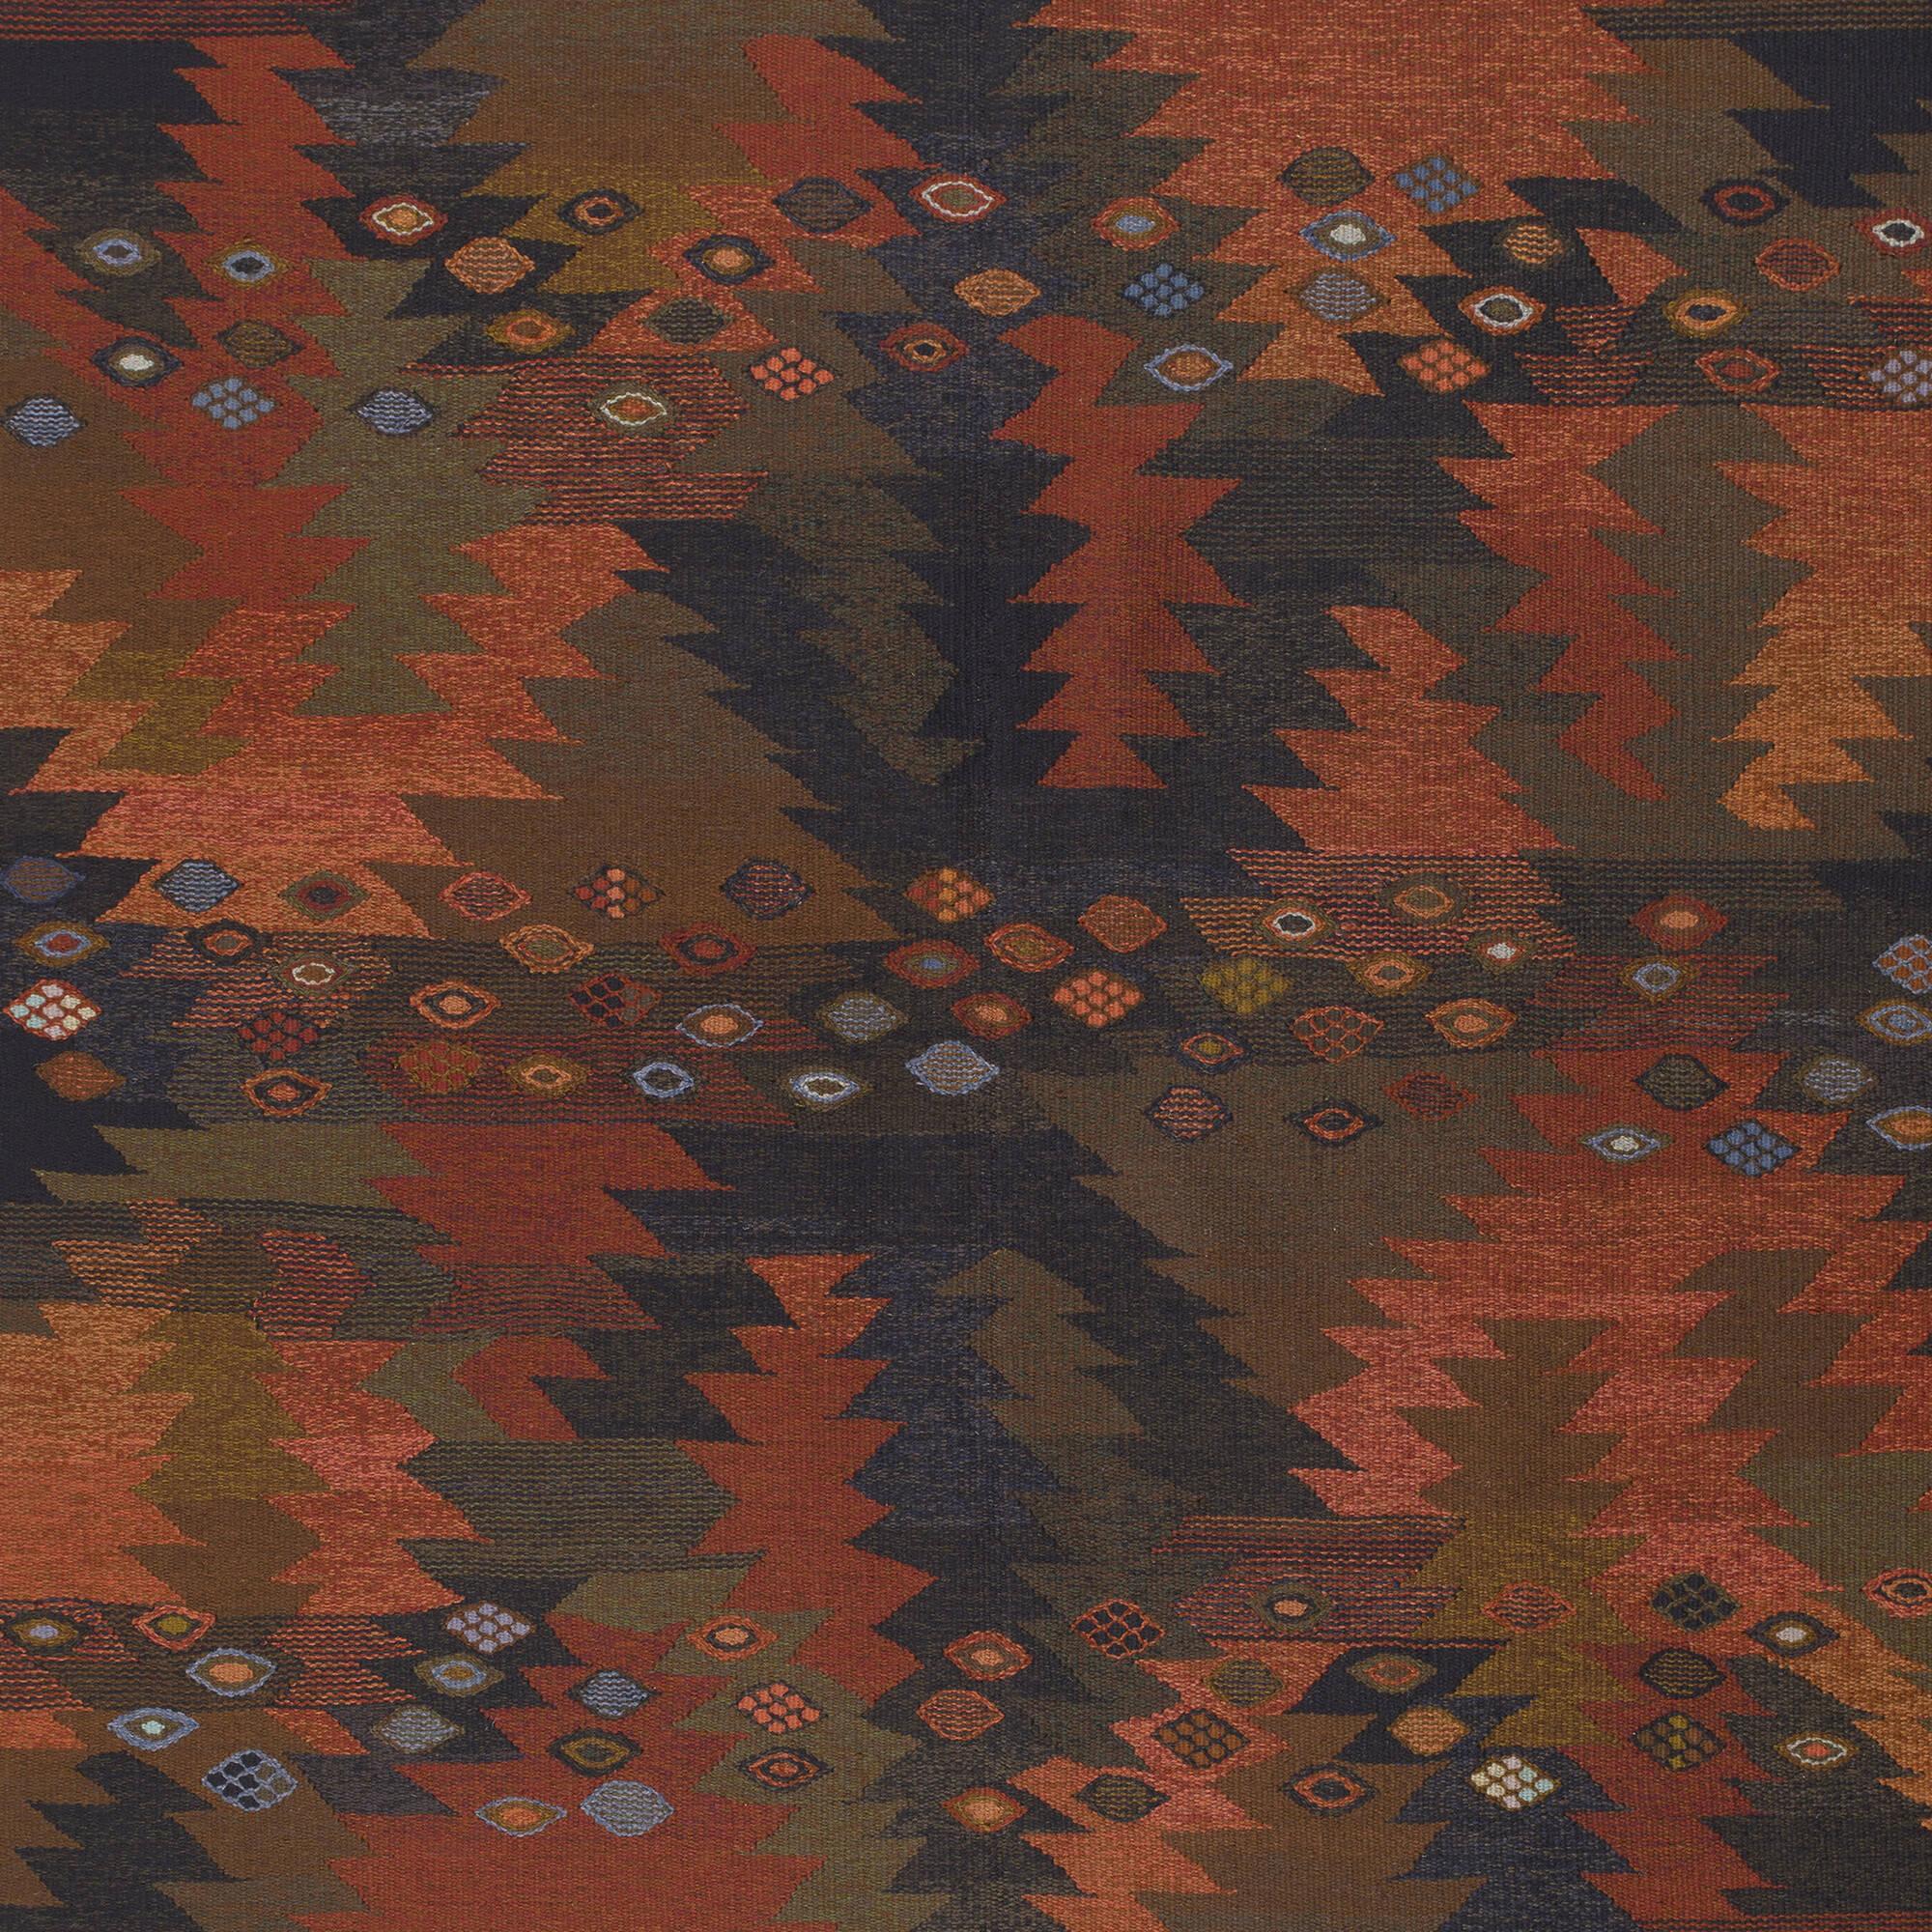 109: Barbro Nilsson / Tånga tapestry weave carpet (3 of 3)